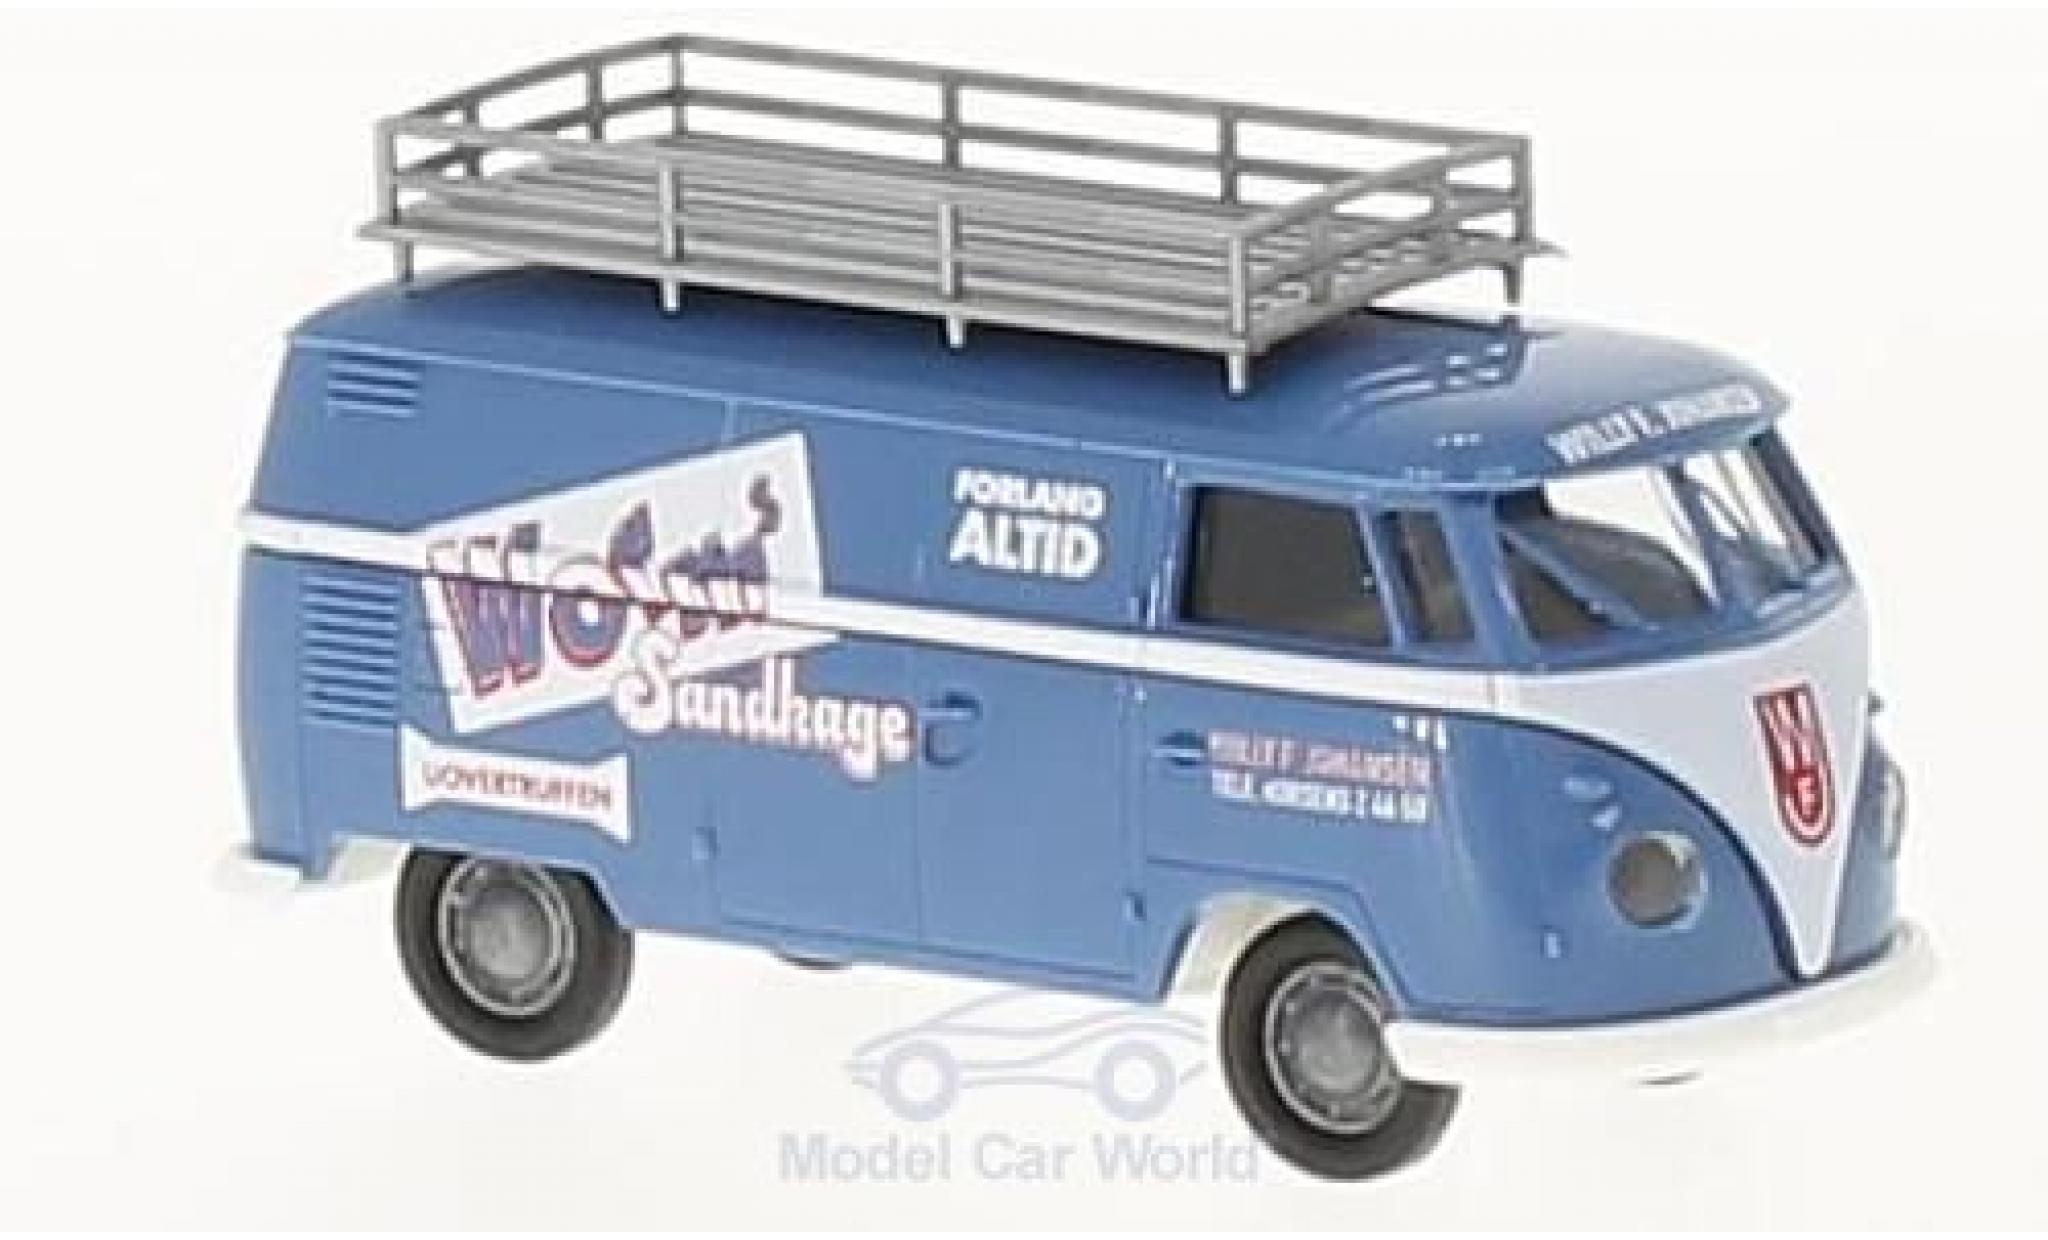 Volkswagen T1 1/87 Brekina b Kasten Worms Sandkage